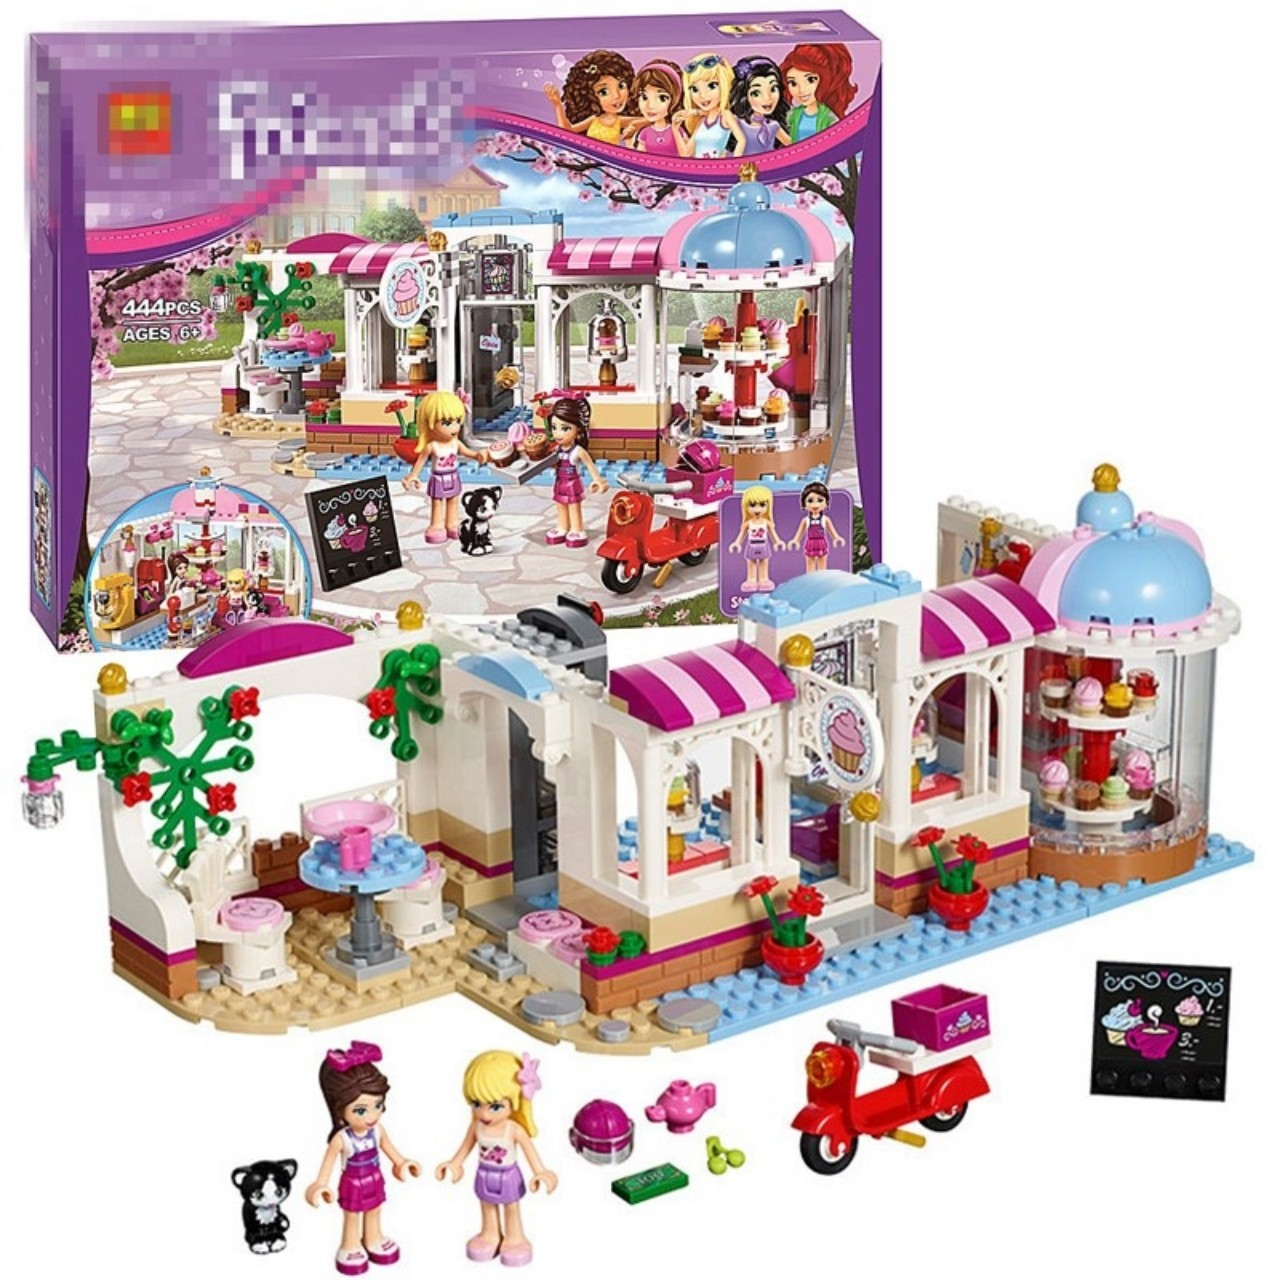 Lego Friends Tiệm bánh ngọt cupcake - Bela 10496